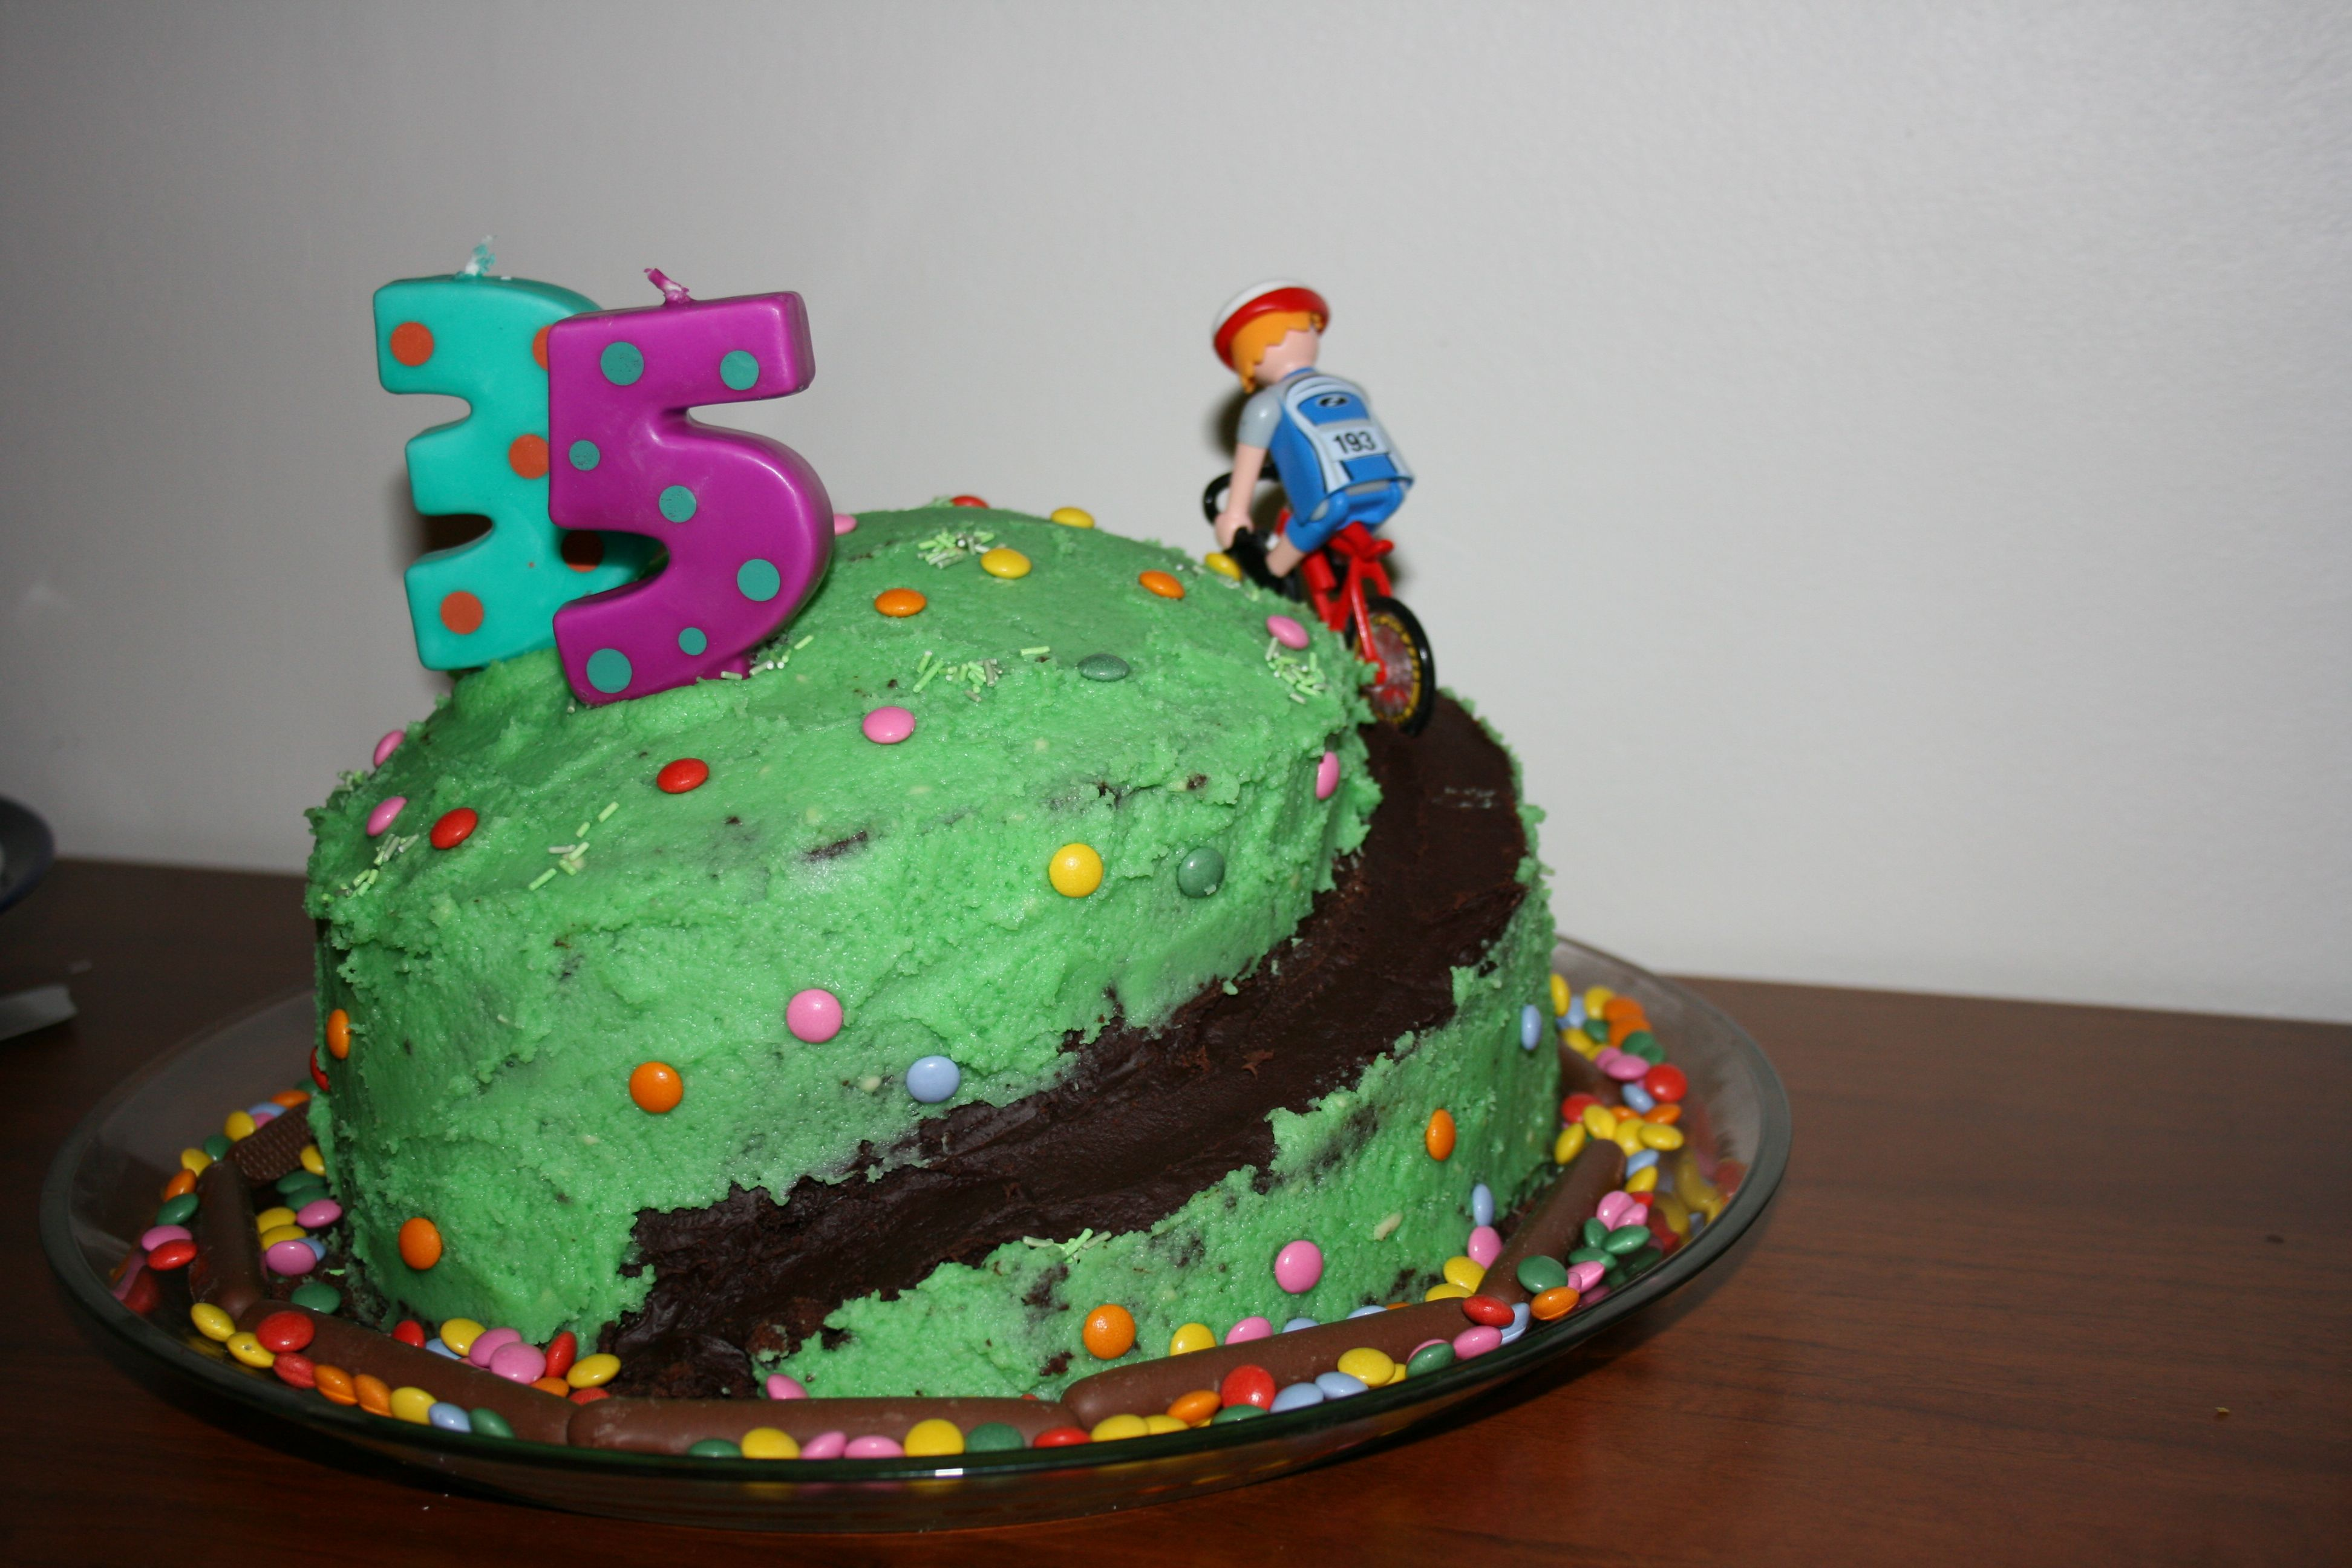 35th birthday cake for my husband 35th birthday cakes